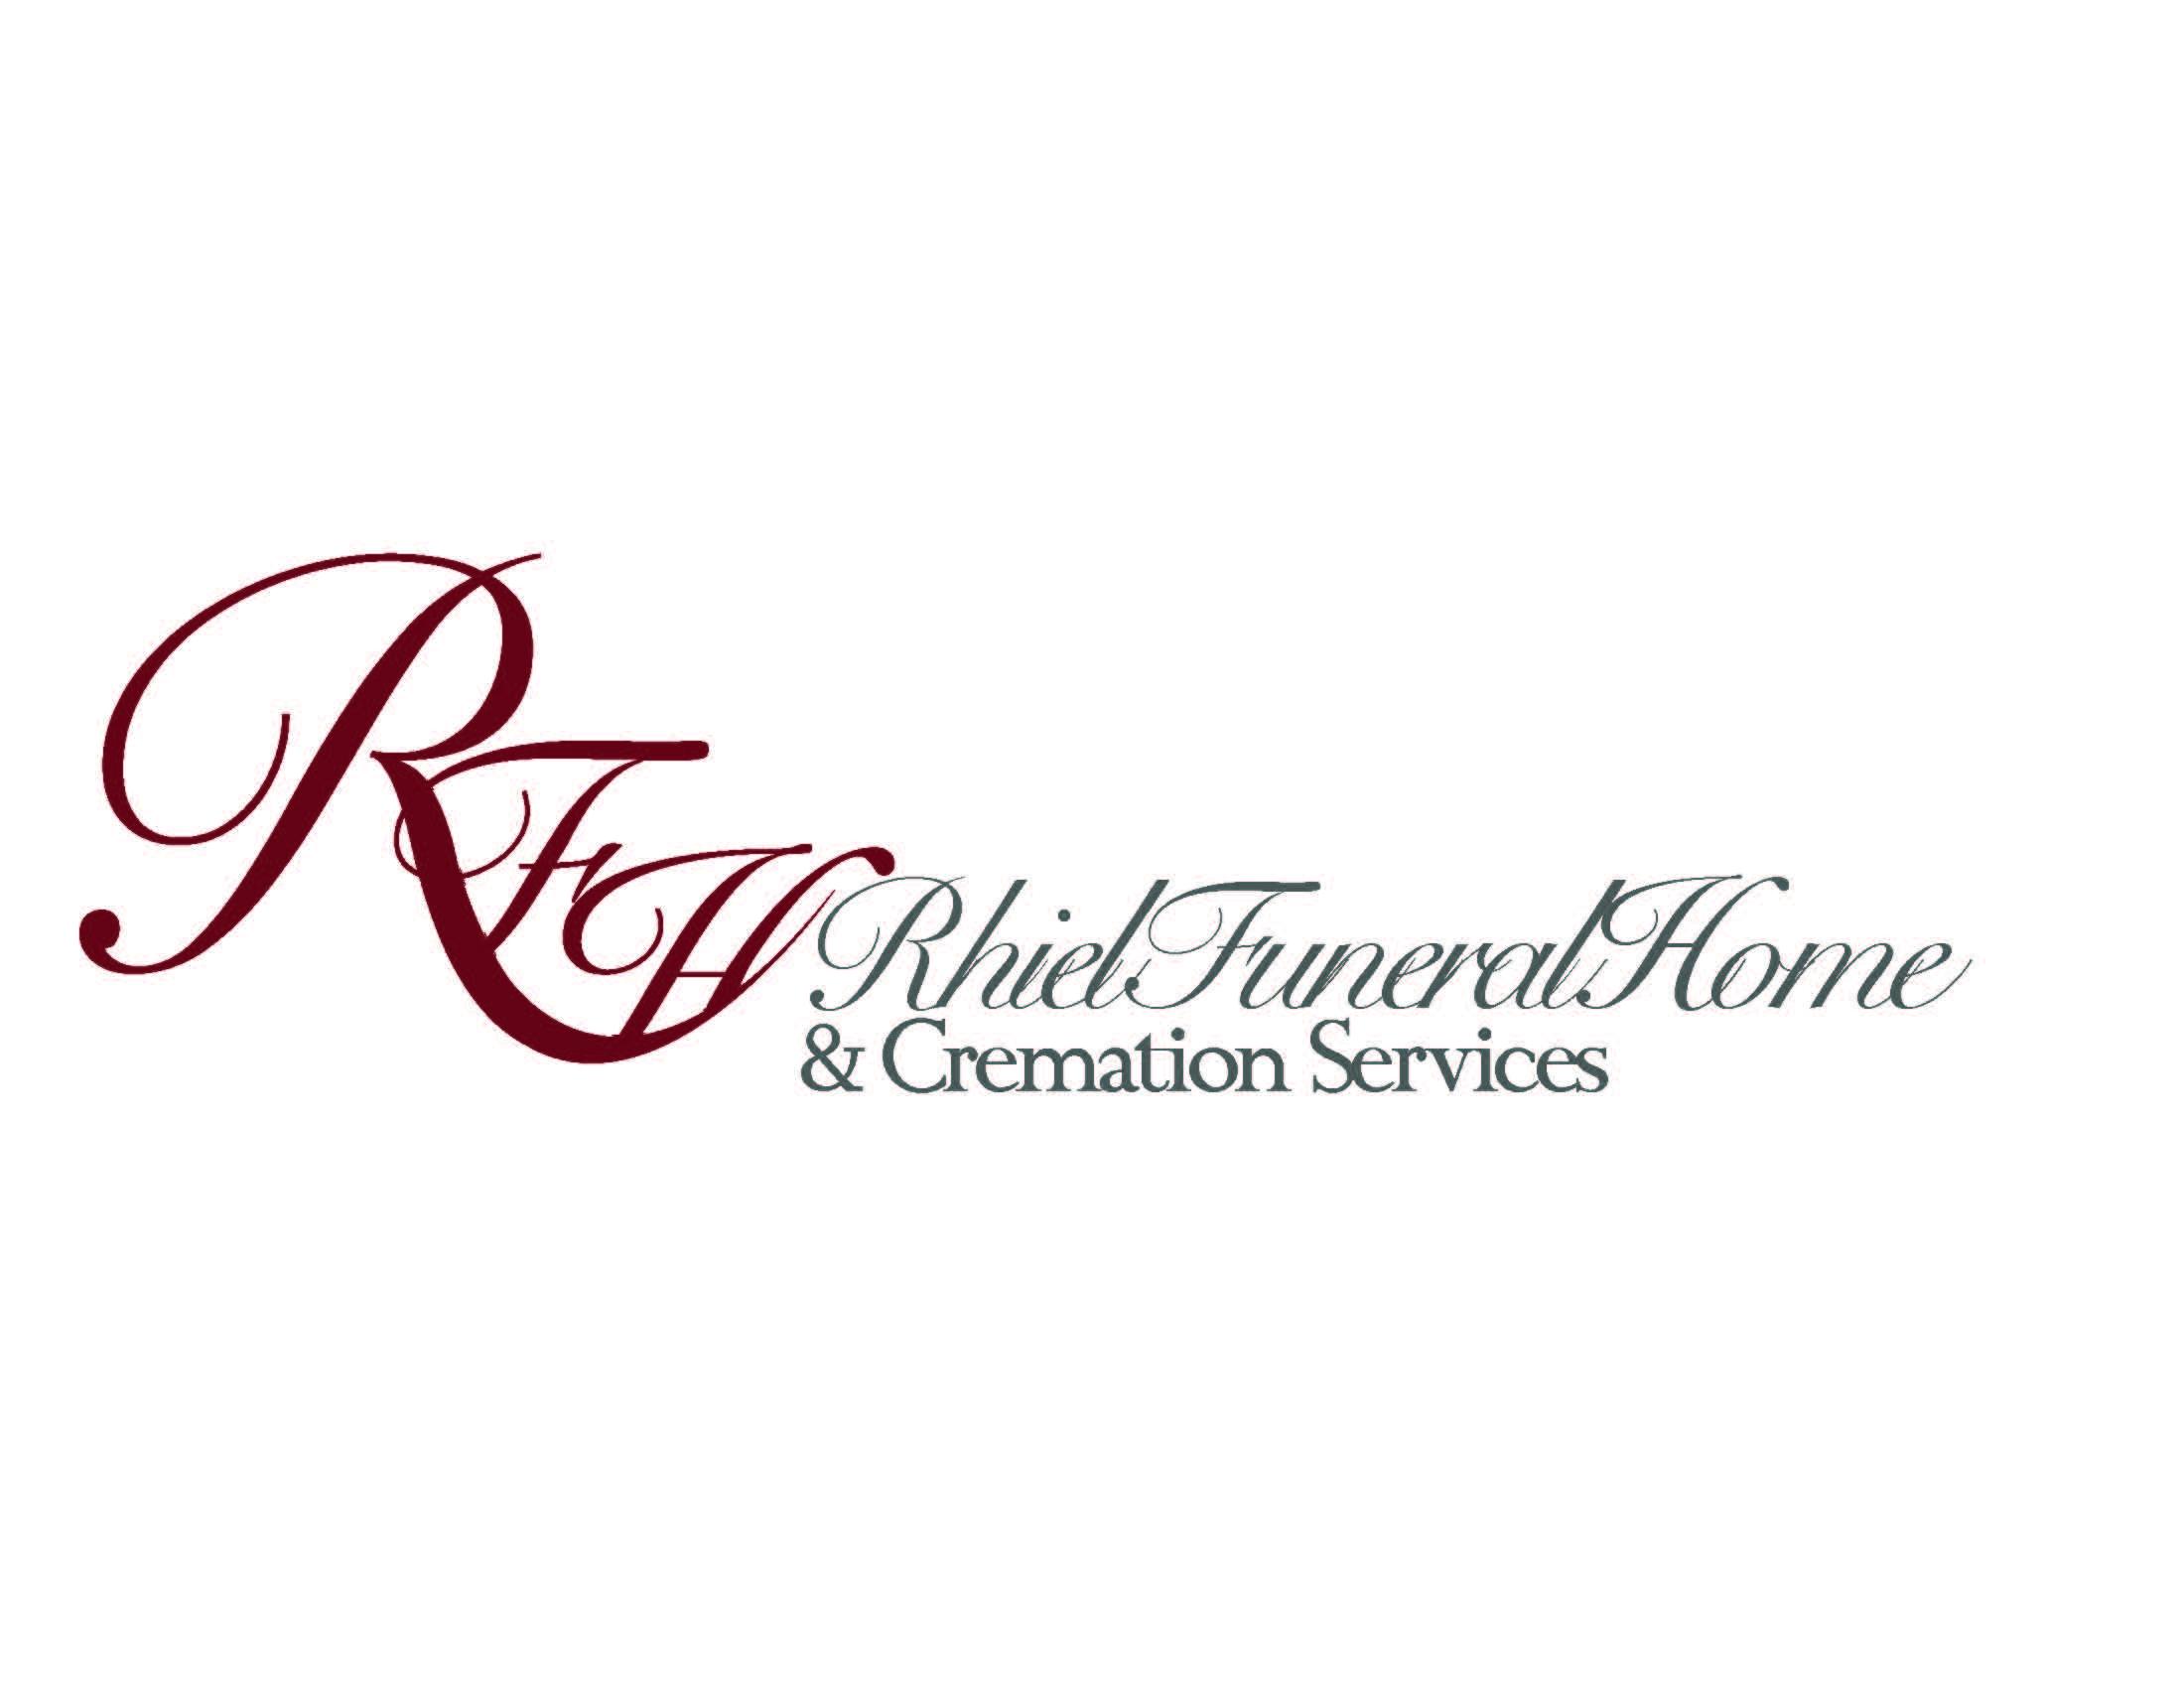 Rheil Funeral Home & Cremation Services Logo